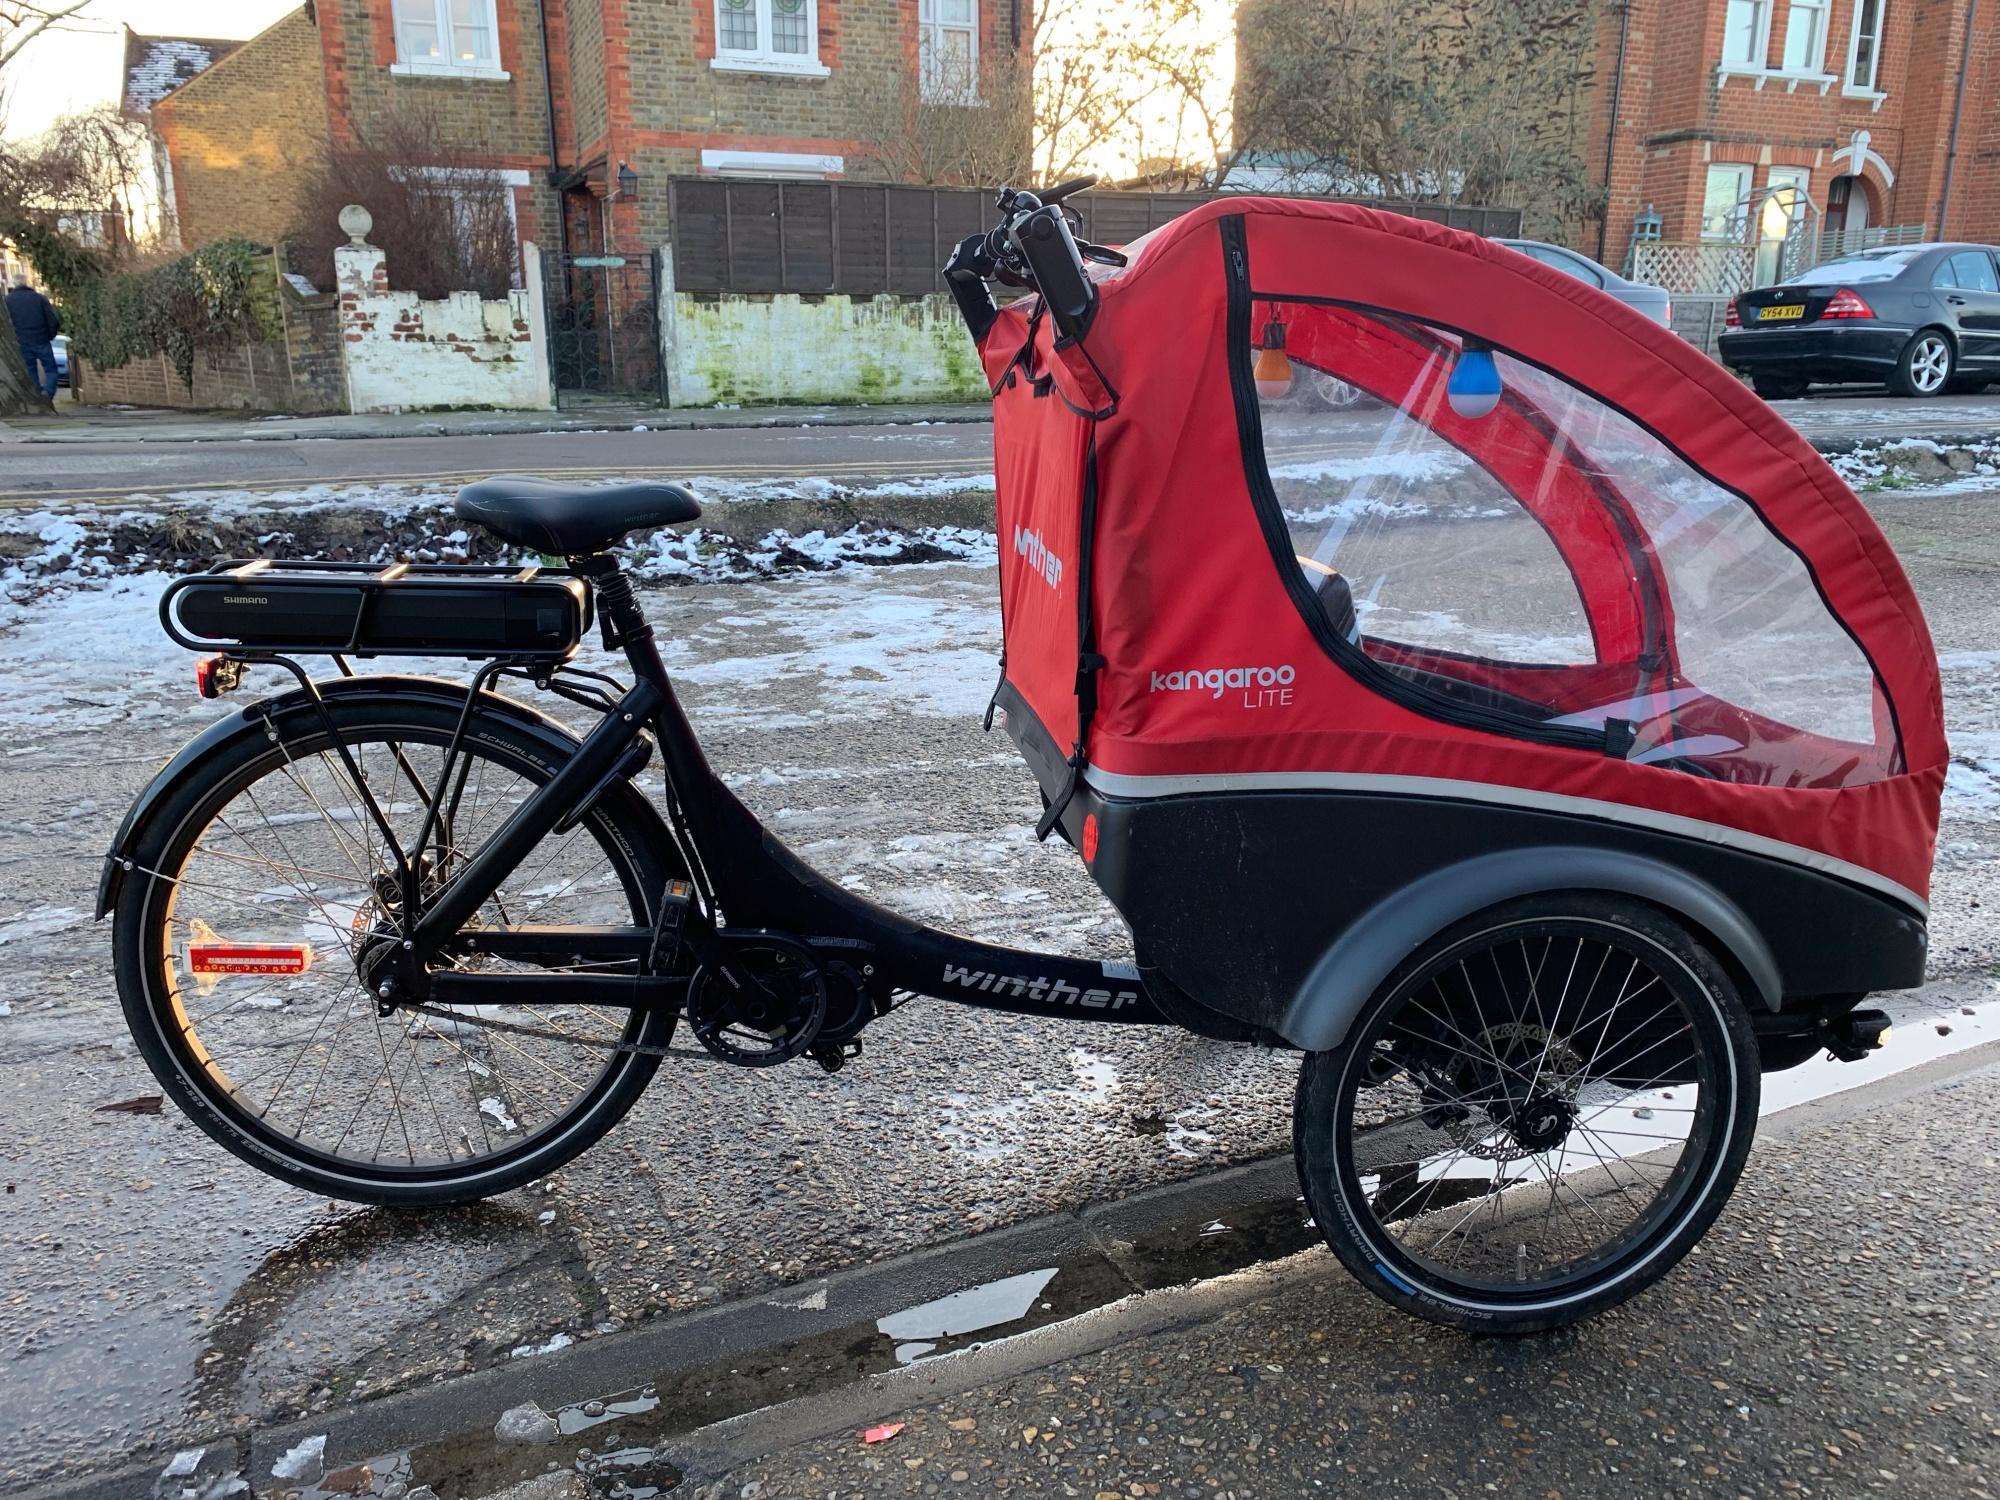 londongreencycles-used-cargo-bike-kangaroo